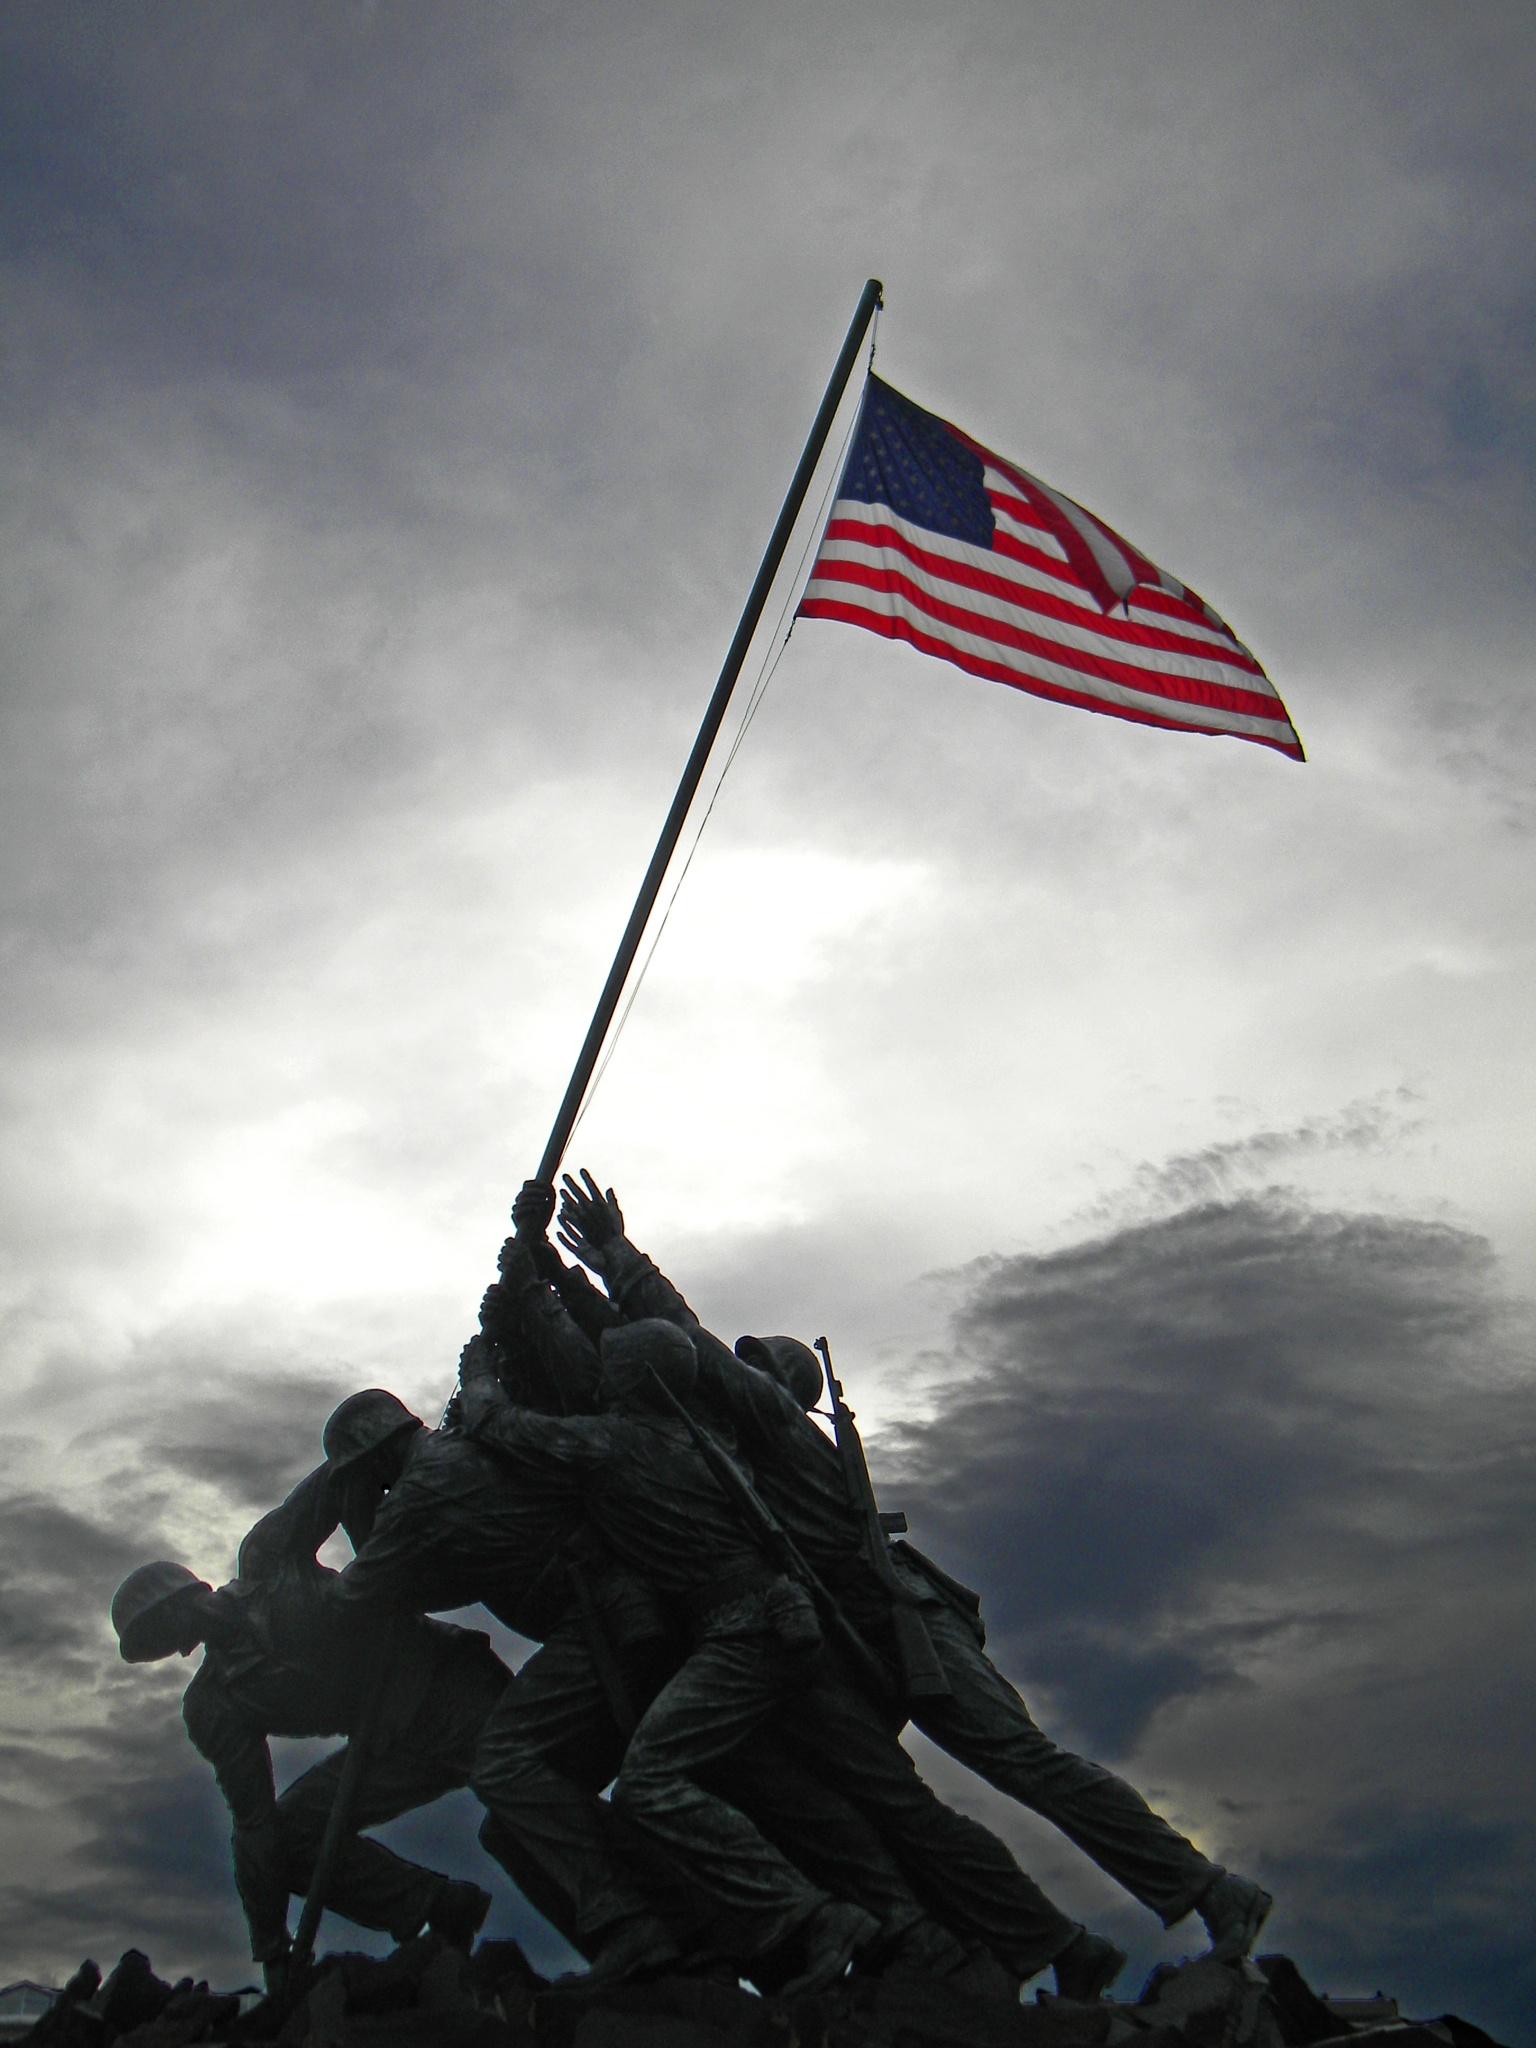 Marine Corps War Memorial by Phillip W. Strunk